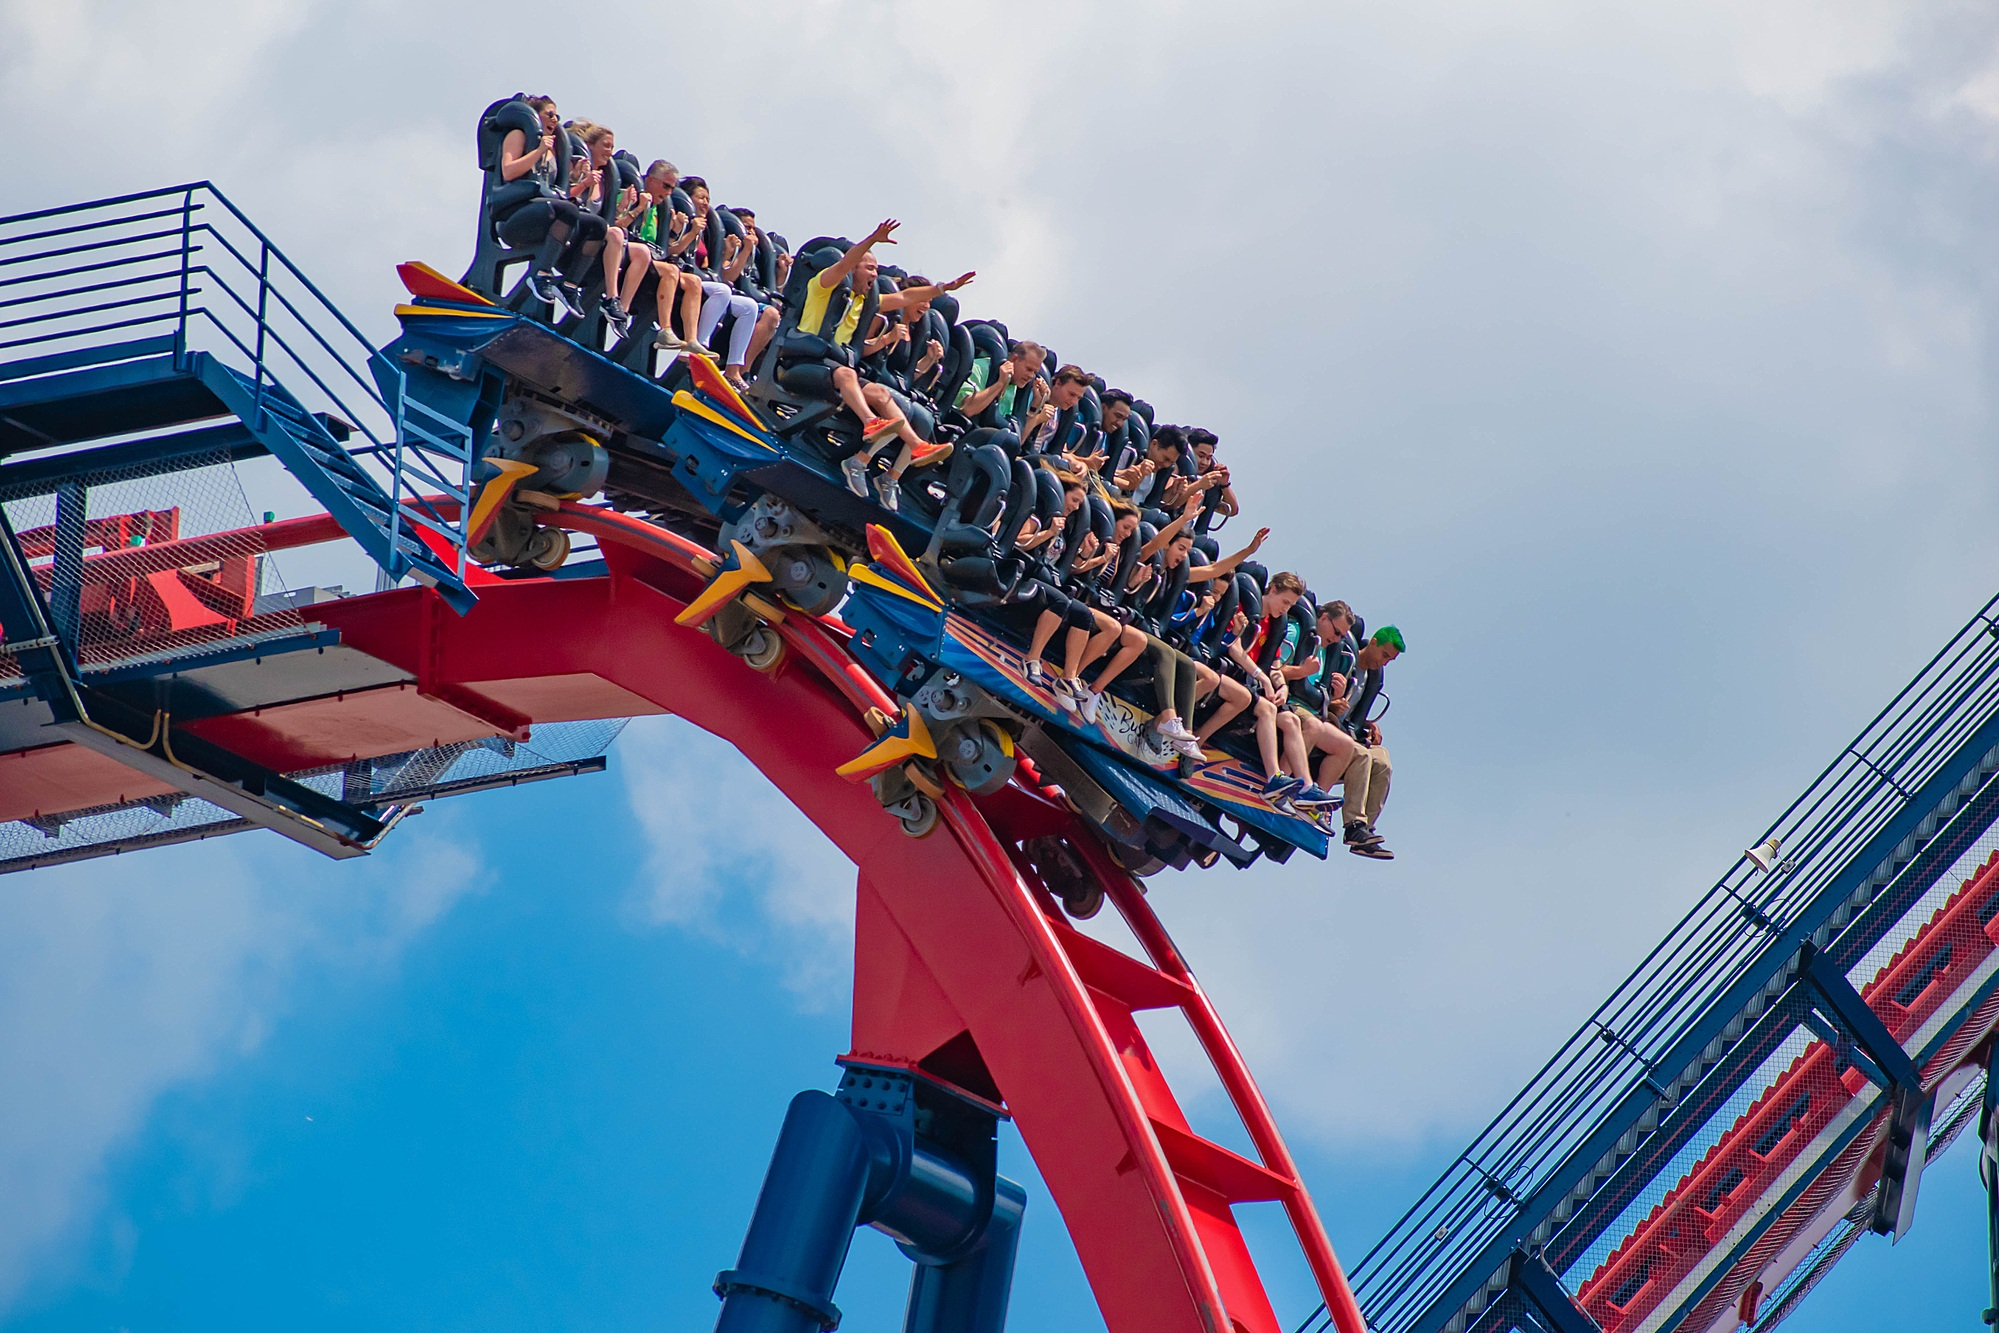 Sheikra roller coaster at Busch Gardens